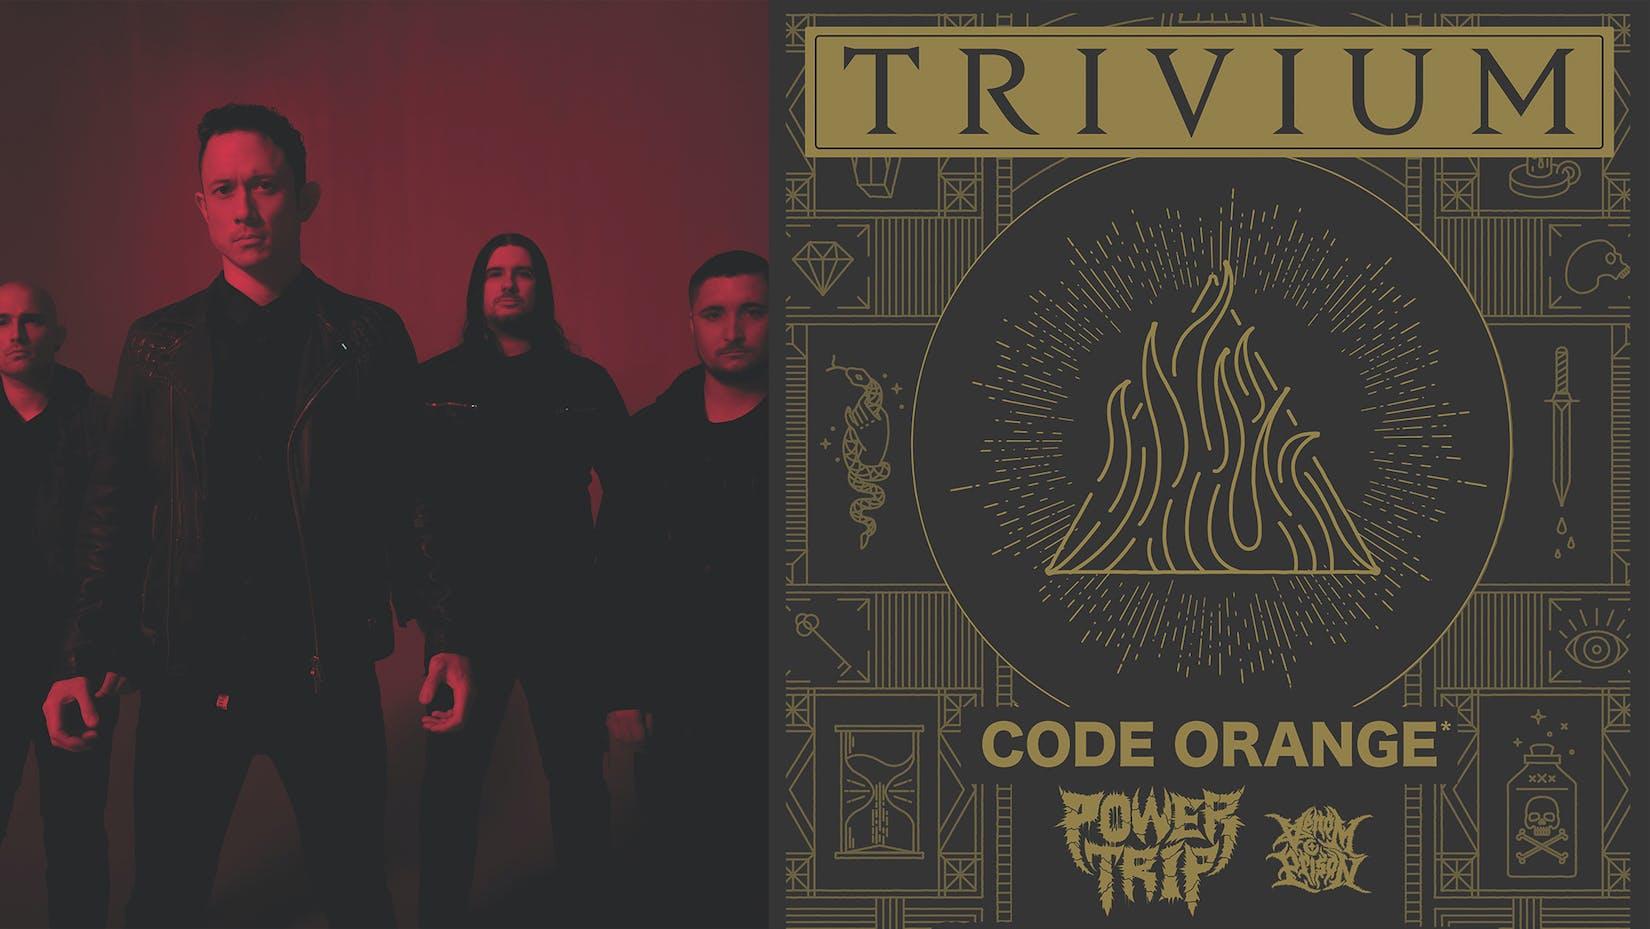 Trivium, Code Orange, Power Trip, Venom Prison To Tour The UK Together